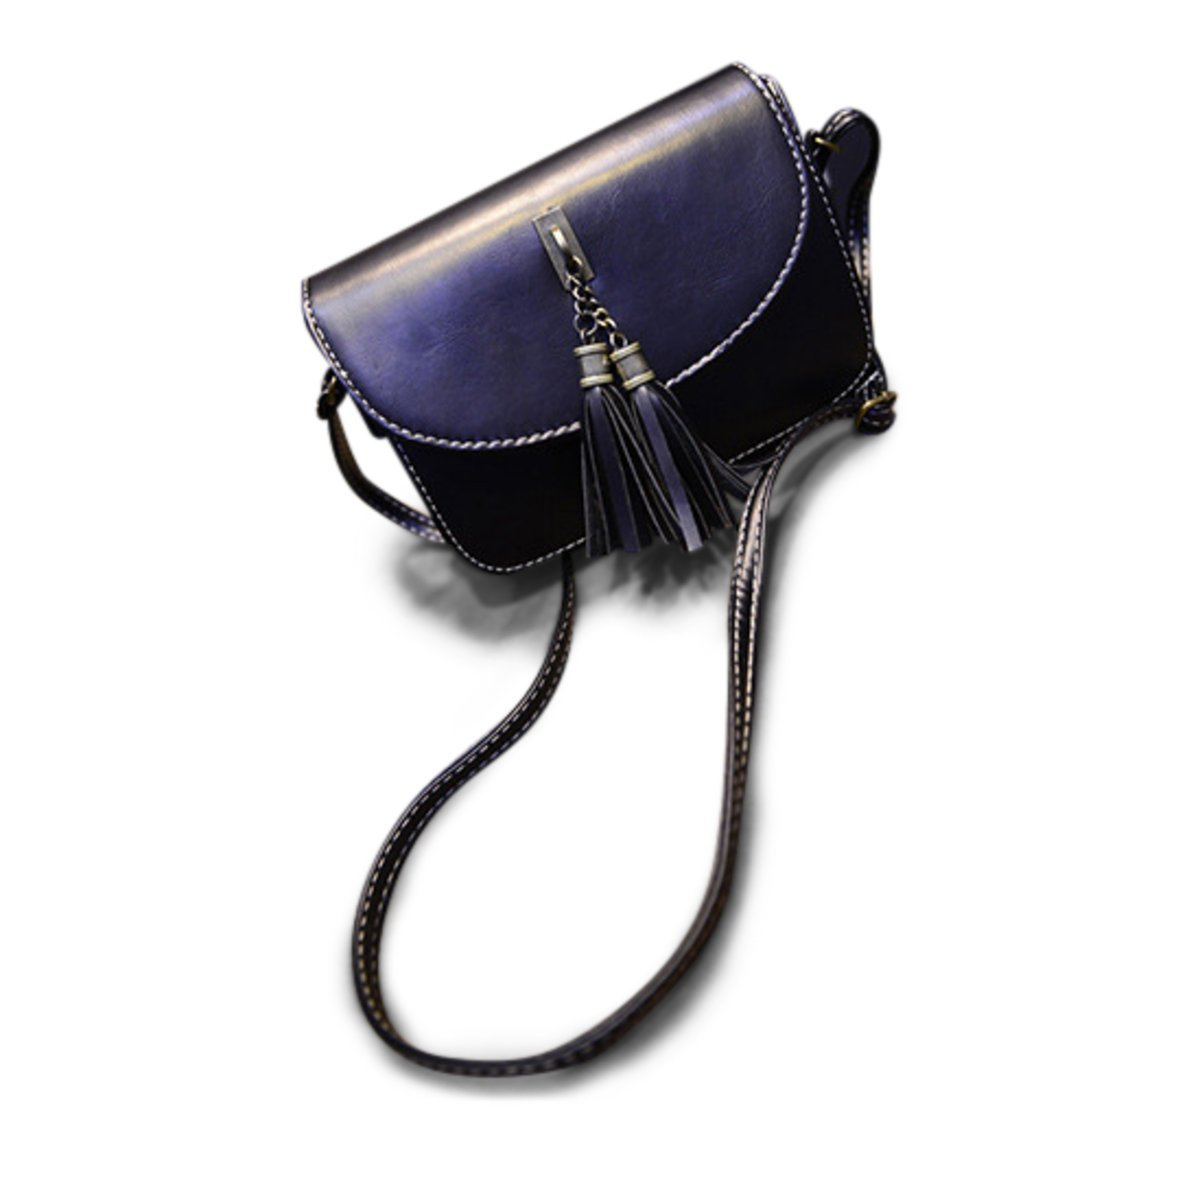 Brag Bag Small Black Leather Handbags For Women Mini Crossbody Purse Tassel Bag Womens Shoulder Bag by BragBag (Image #1)